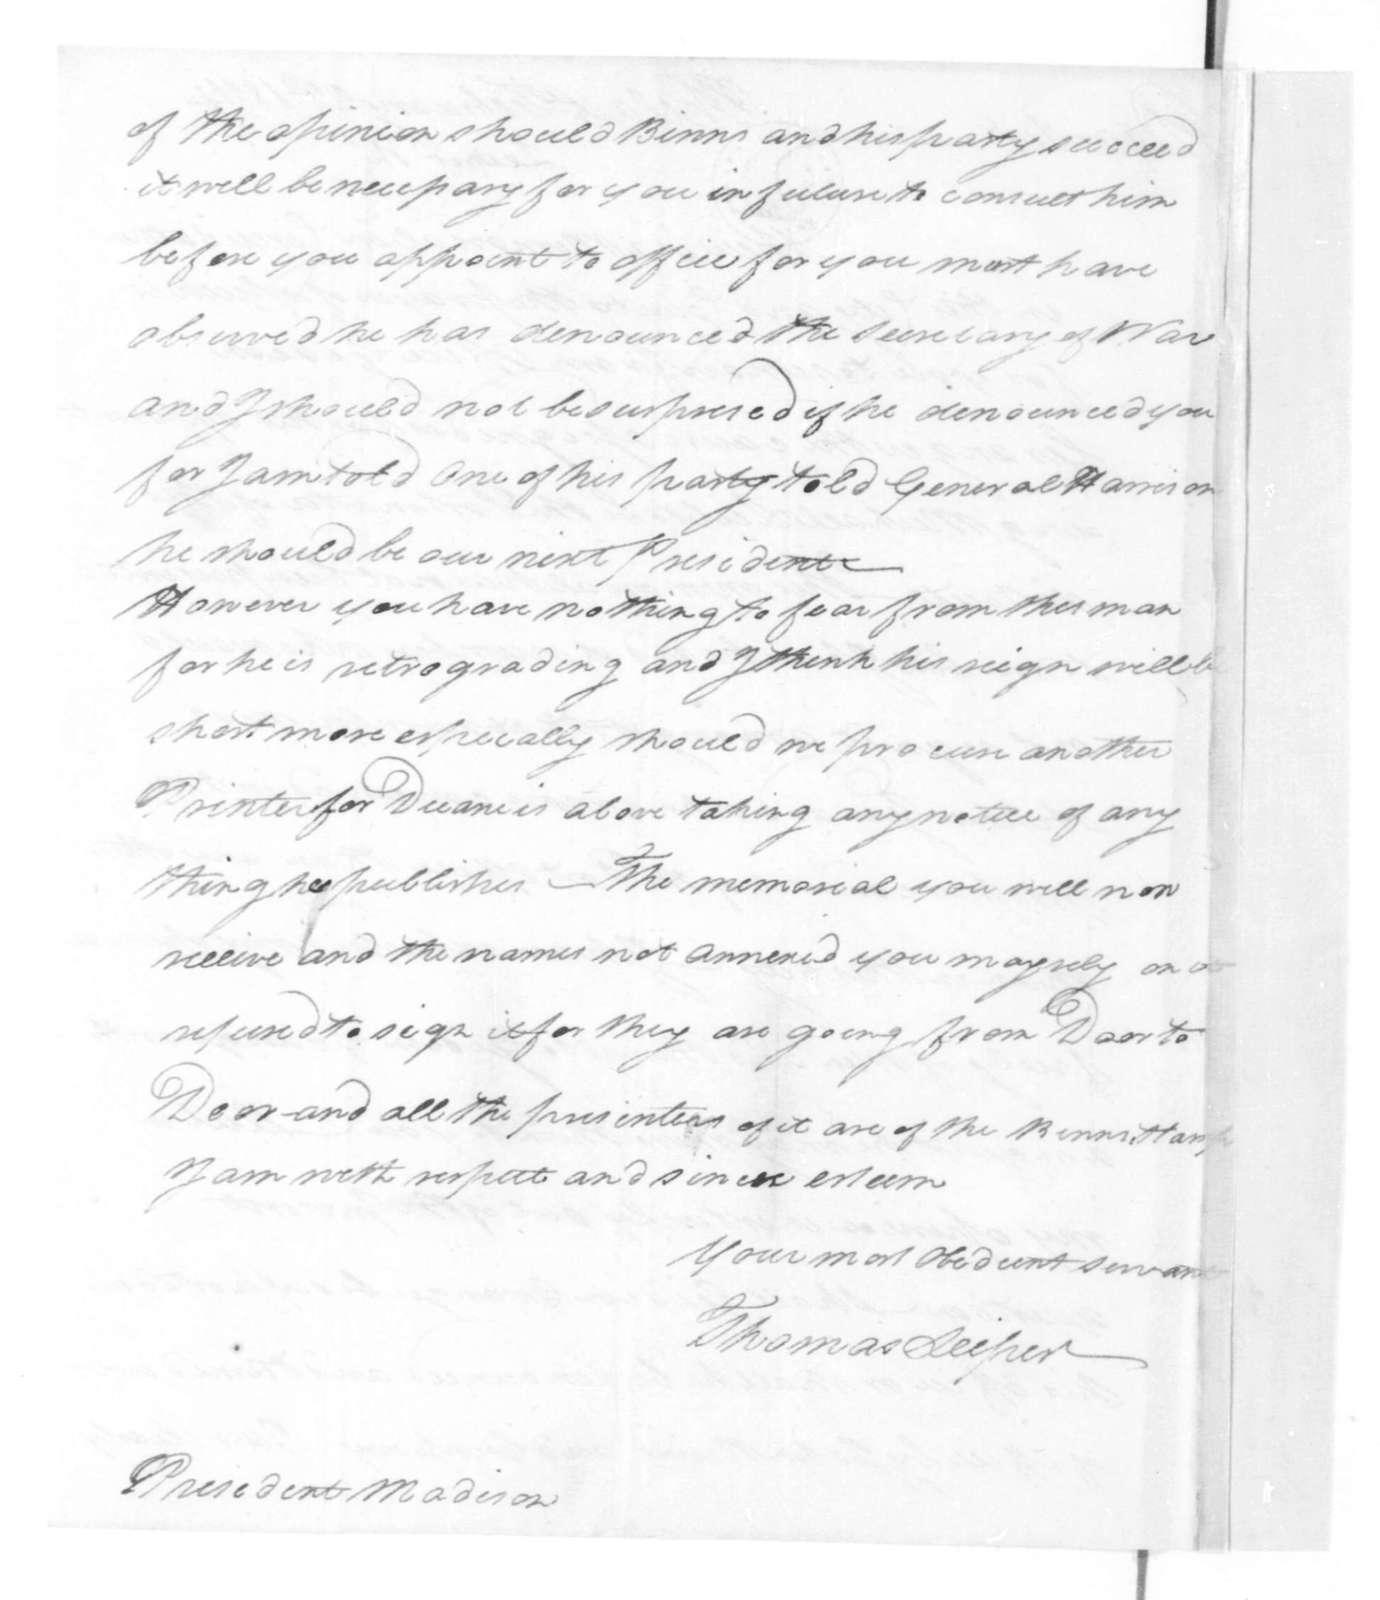 Thomas Leiper to James Madison, February 22, 1814.